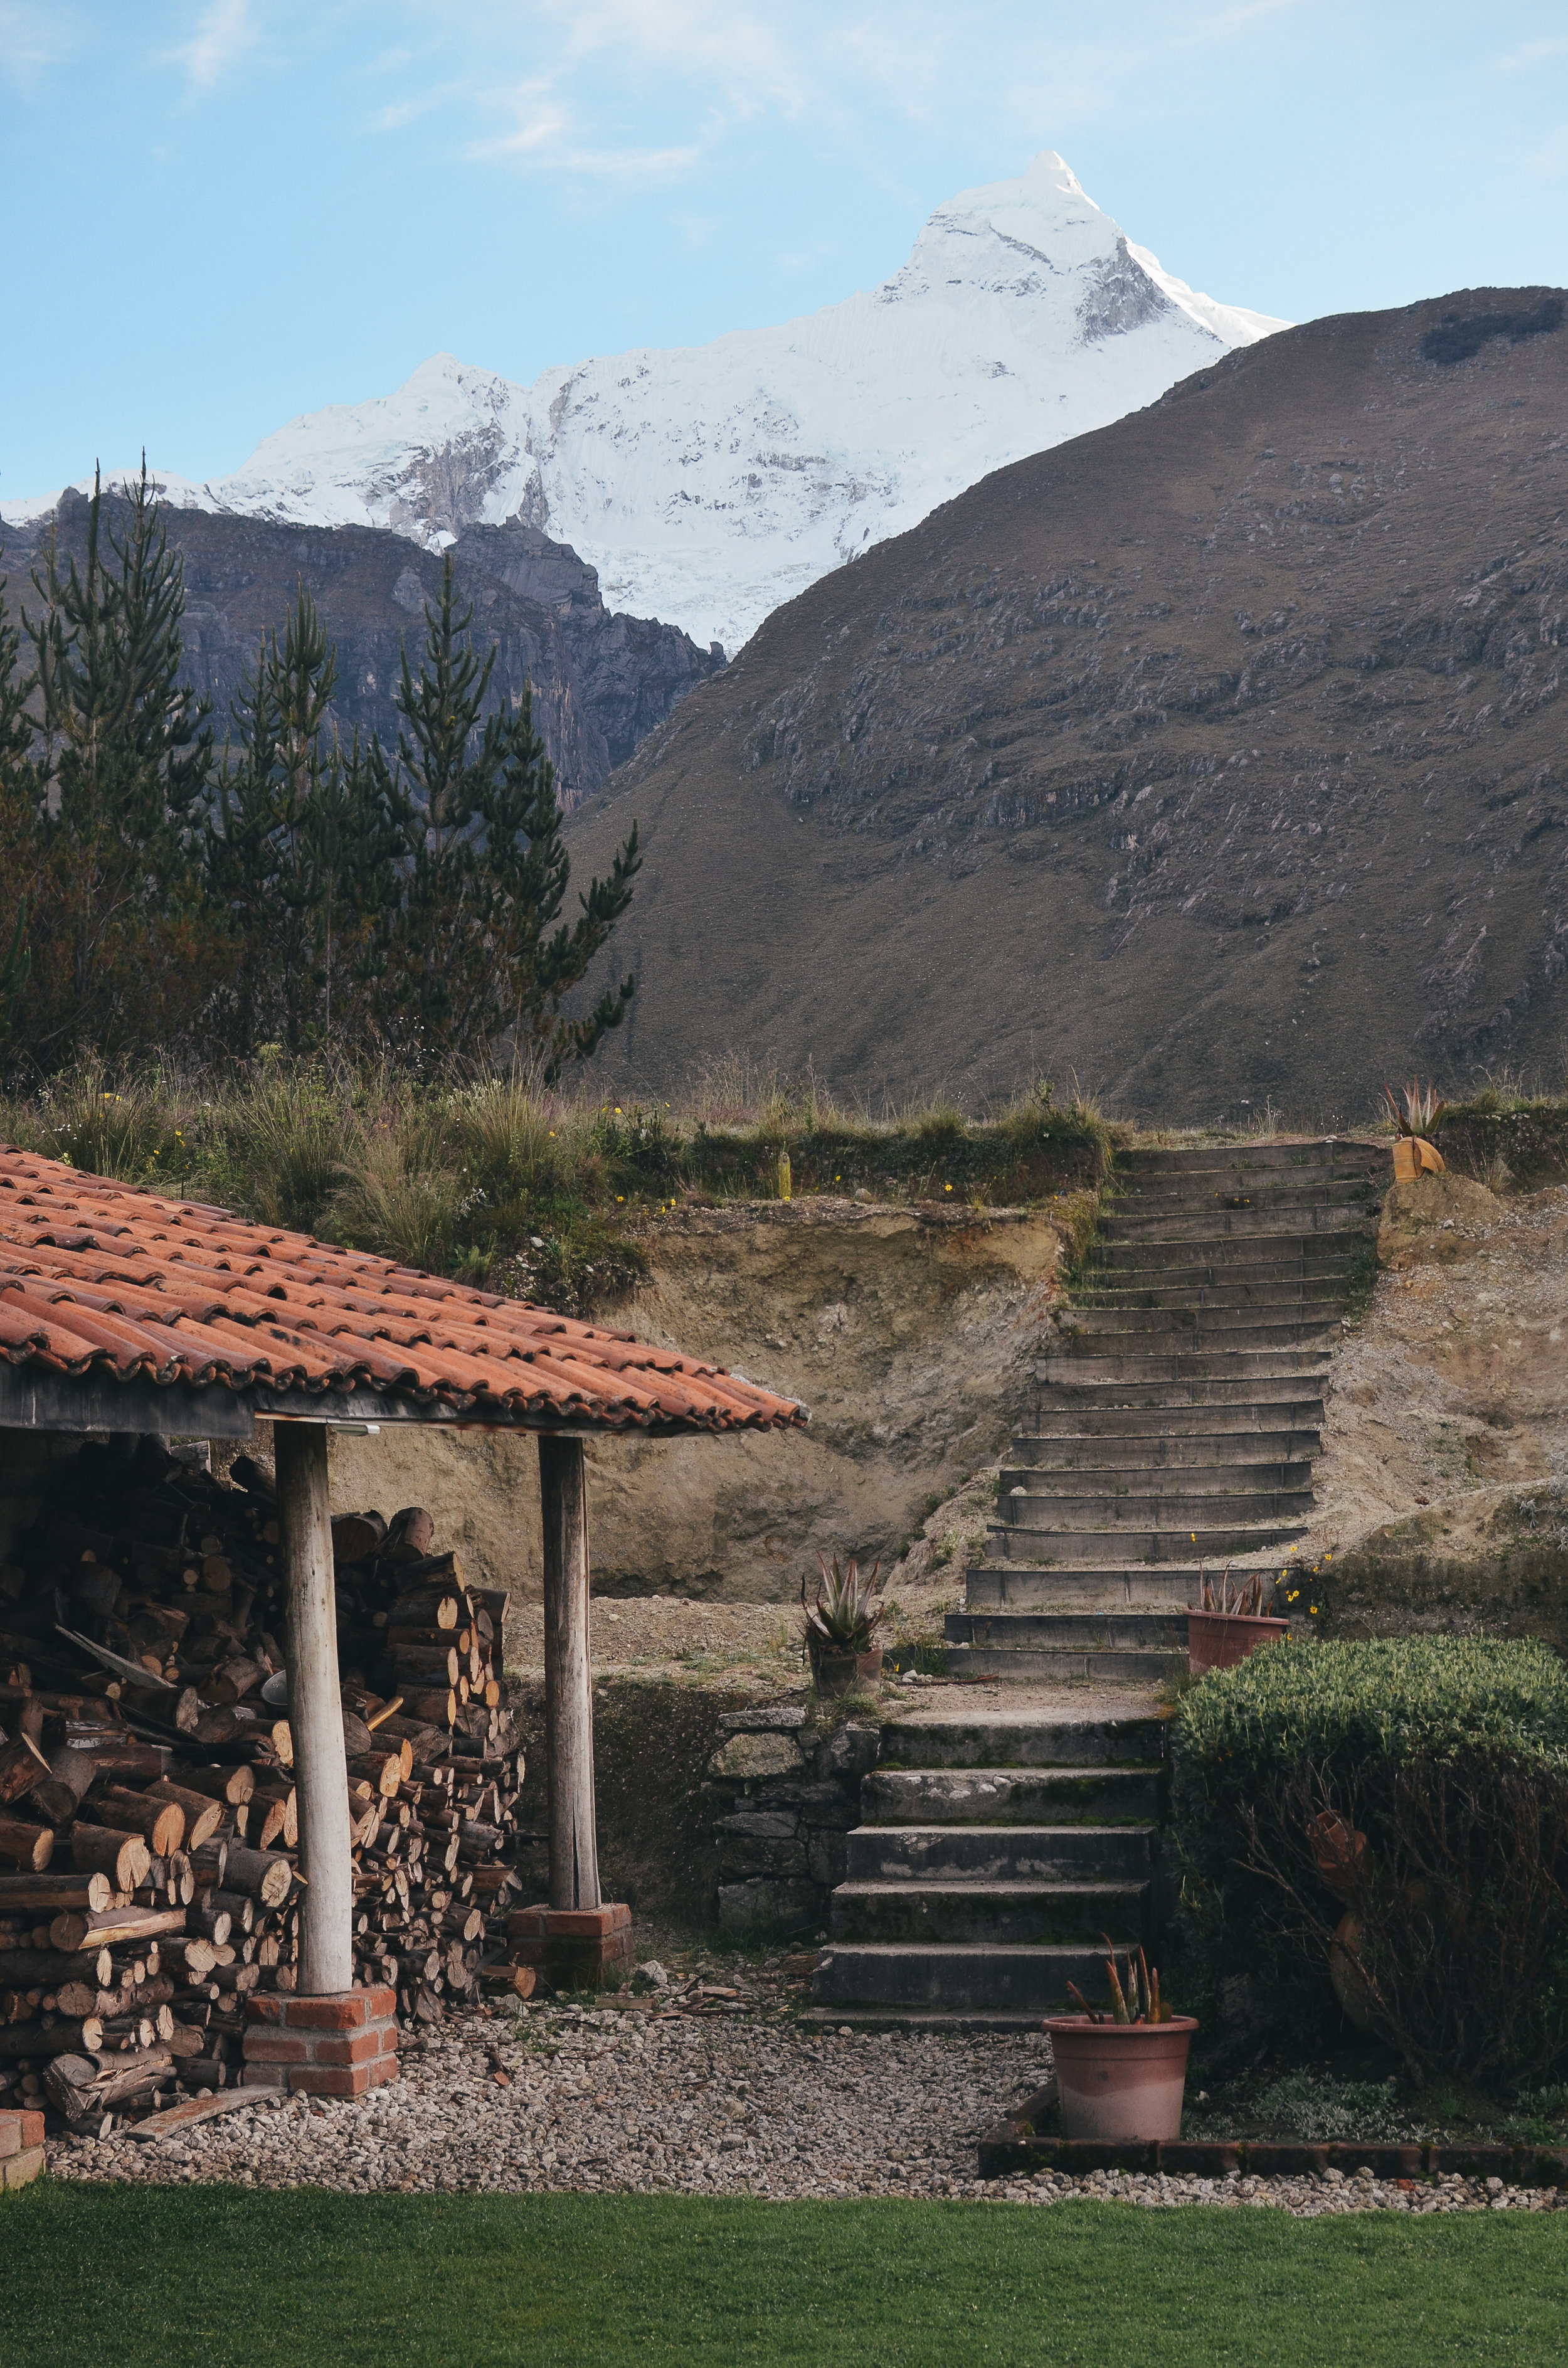 laguna+lake+69+hike+peru+travel+guide+life+on+pine_DSC_0438.jpg